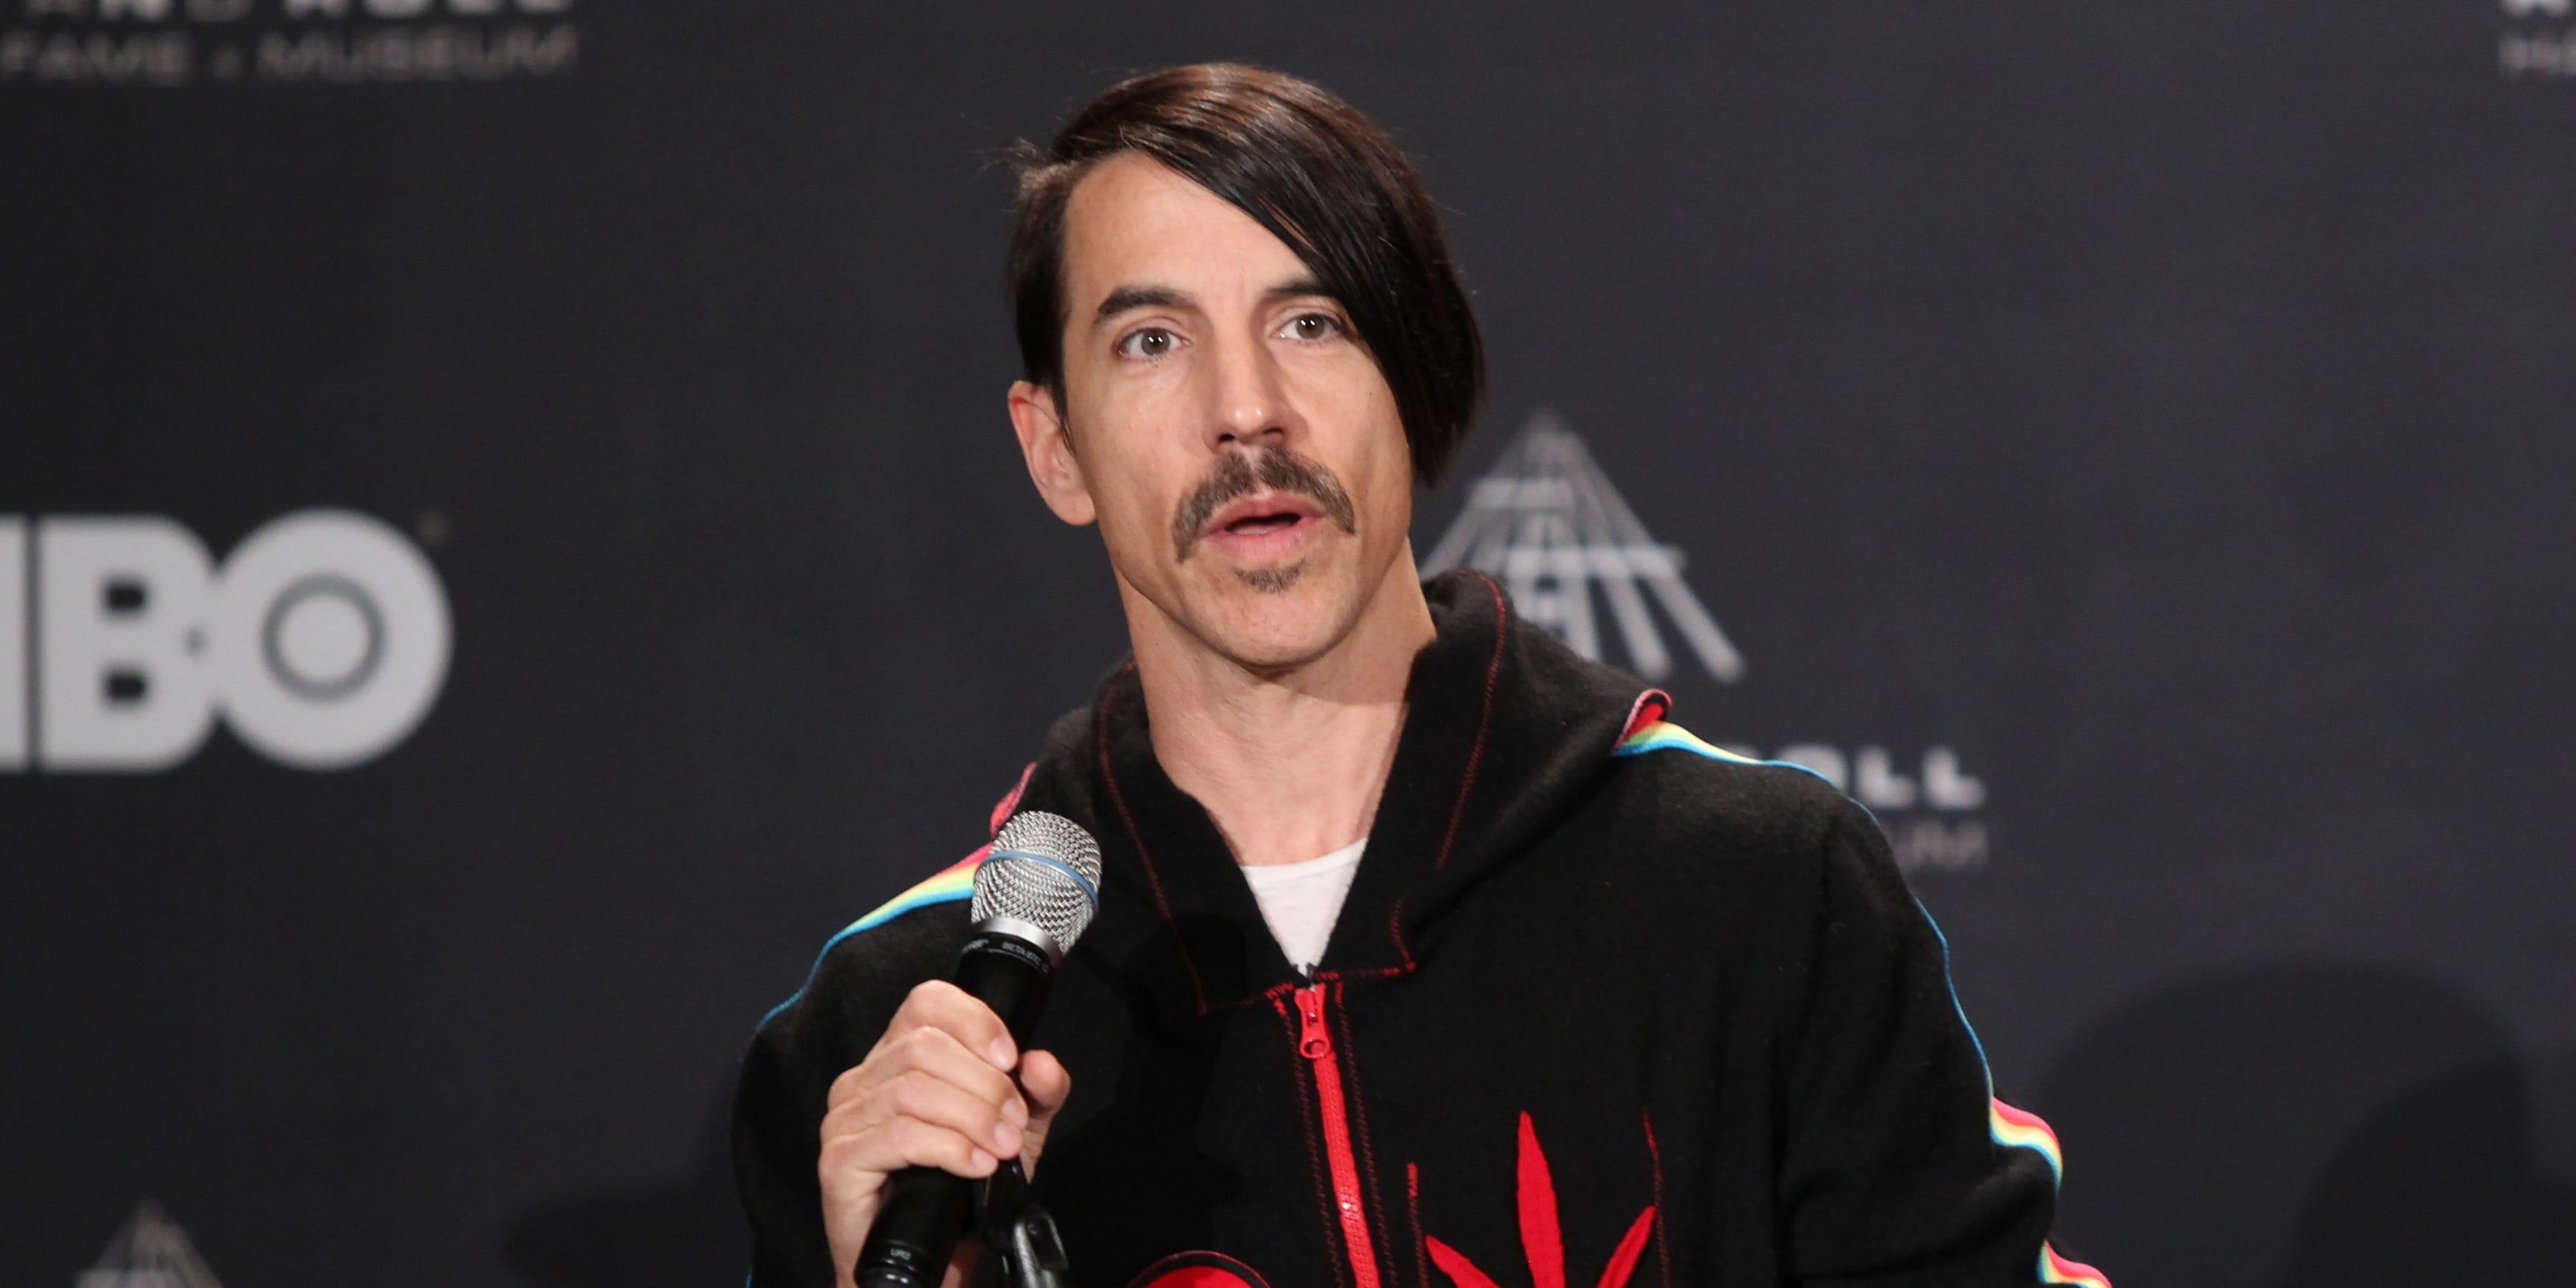 Anthony Kiedis Net Worth - Celebrity Net Worth